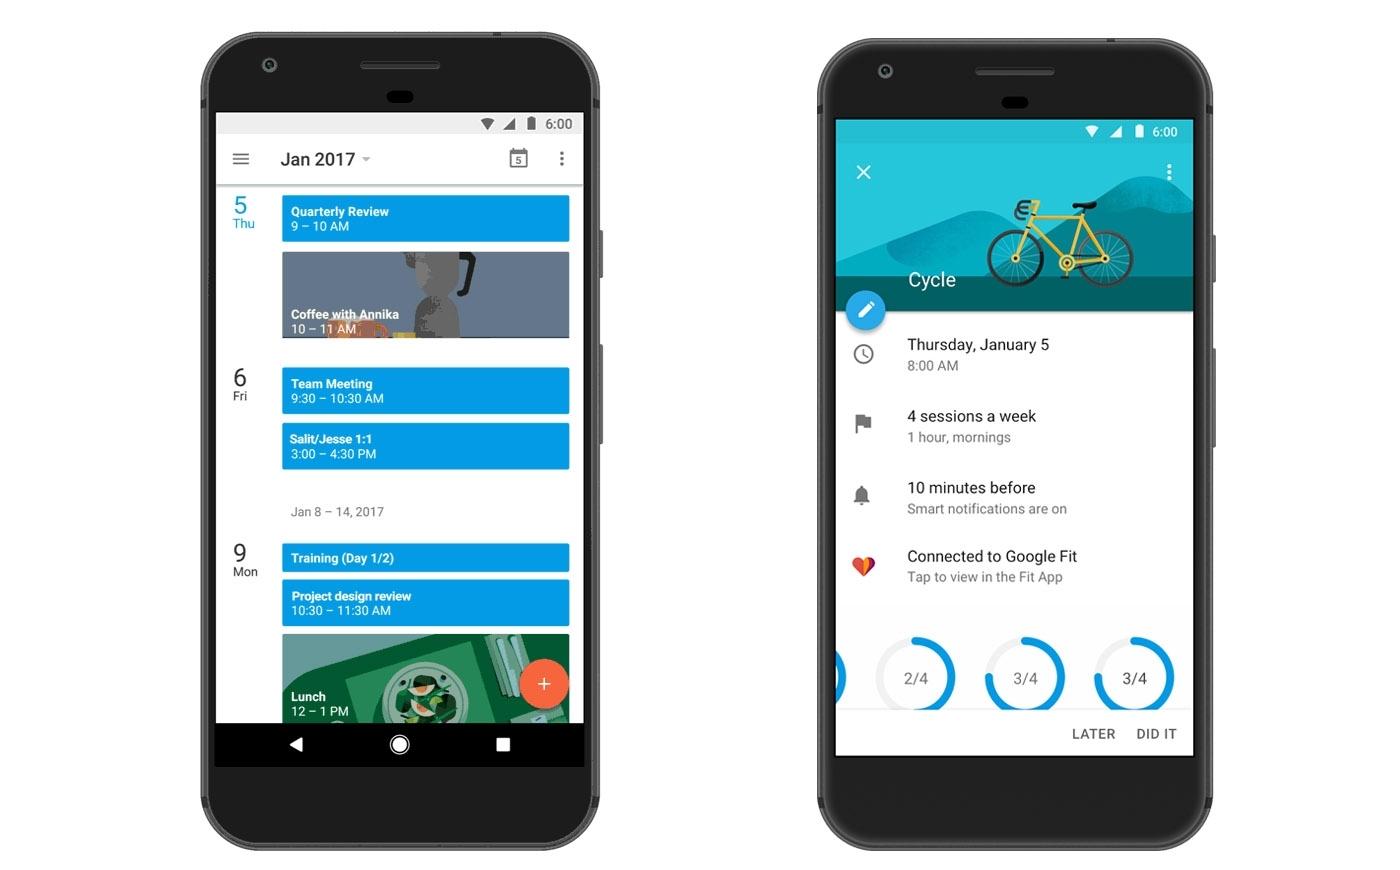 Google Calendar Helps With Fitness Goalslogging Workouts